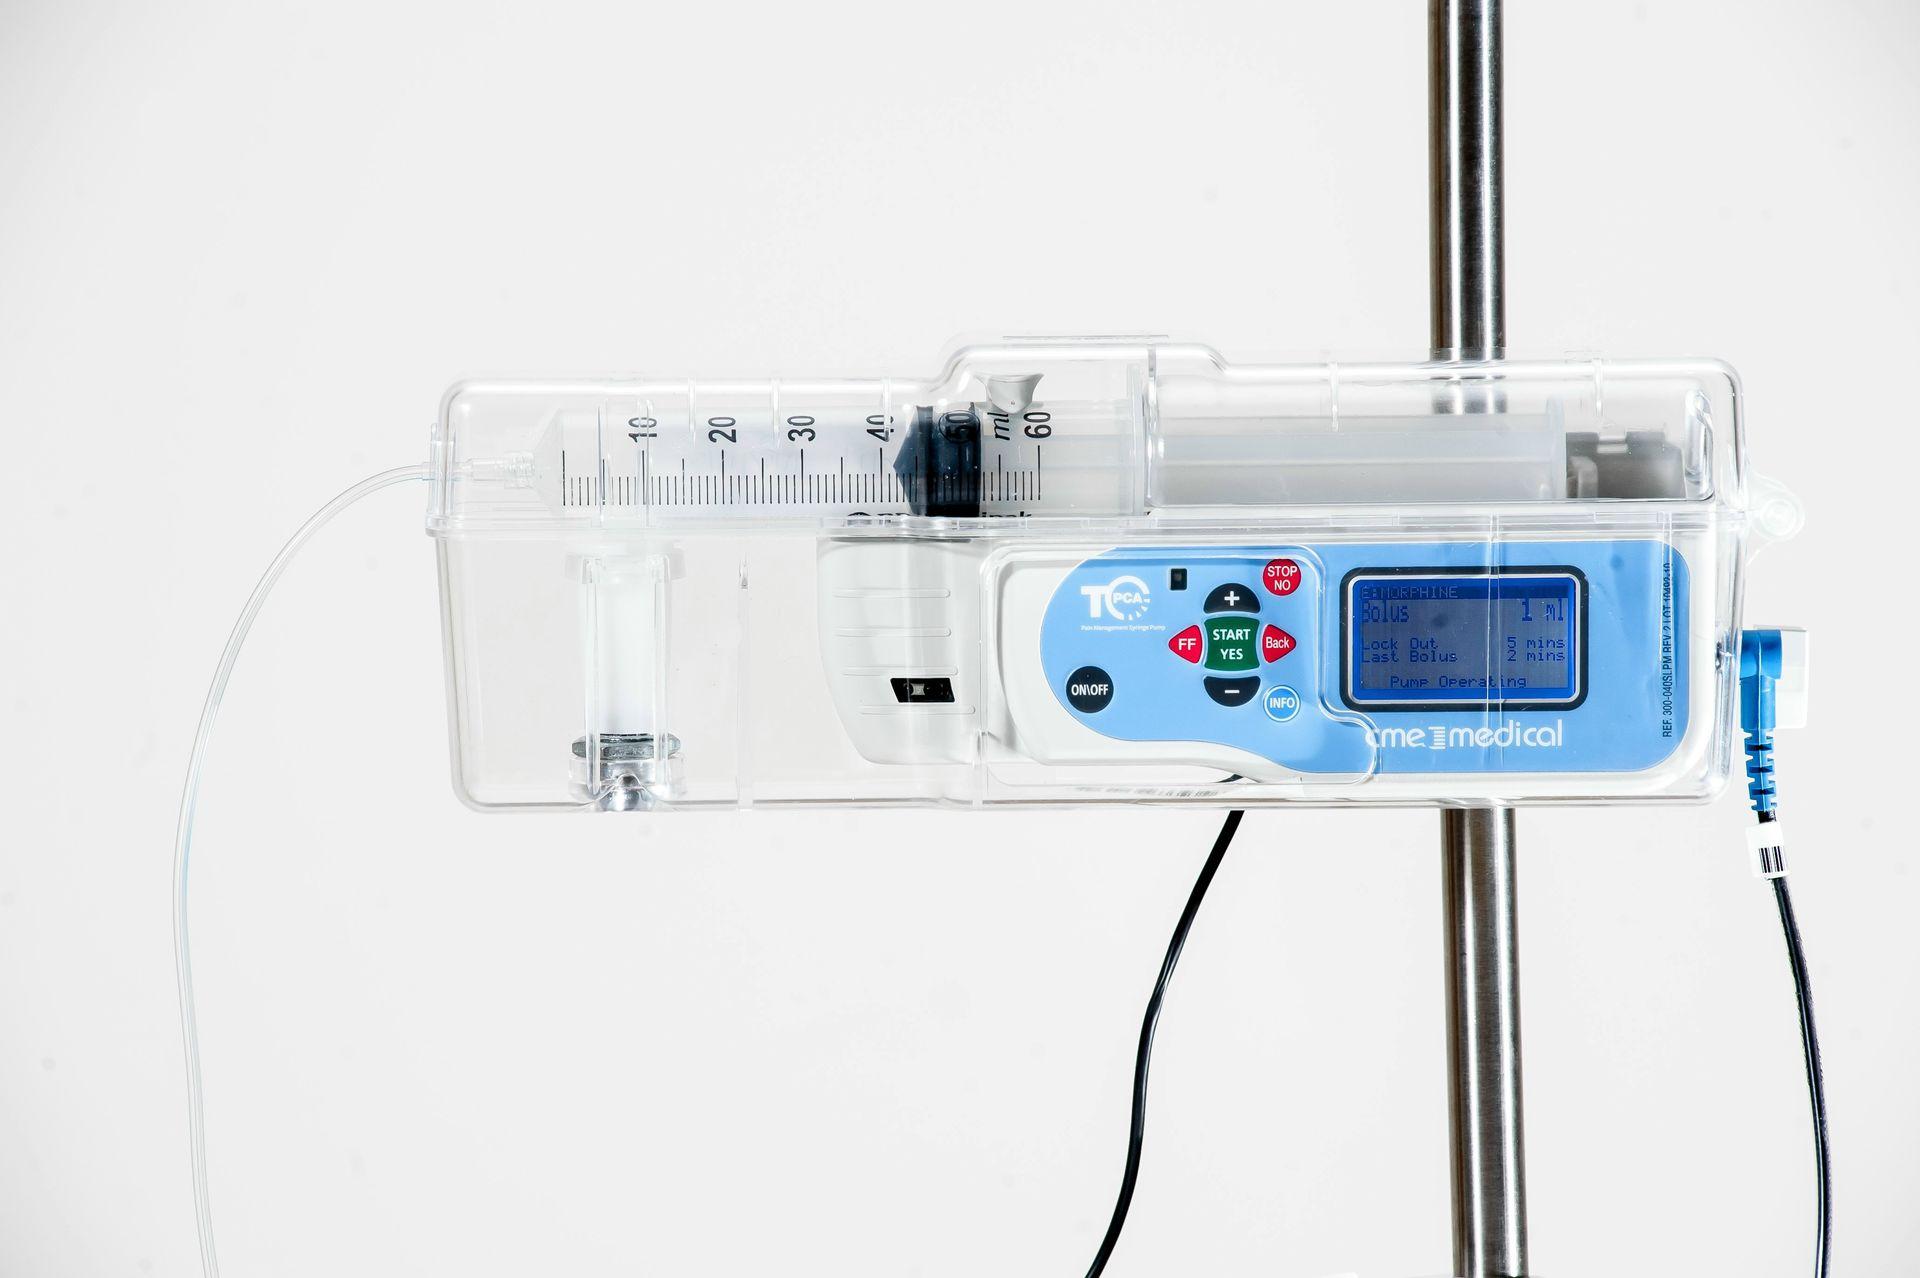 cme-0365-medical